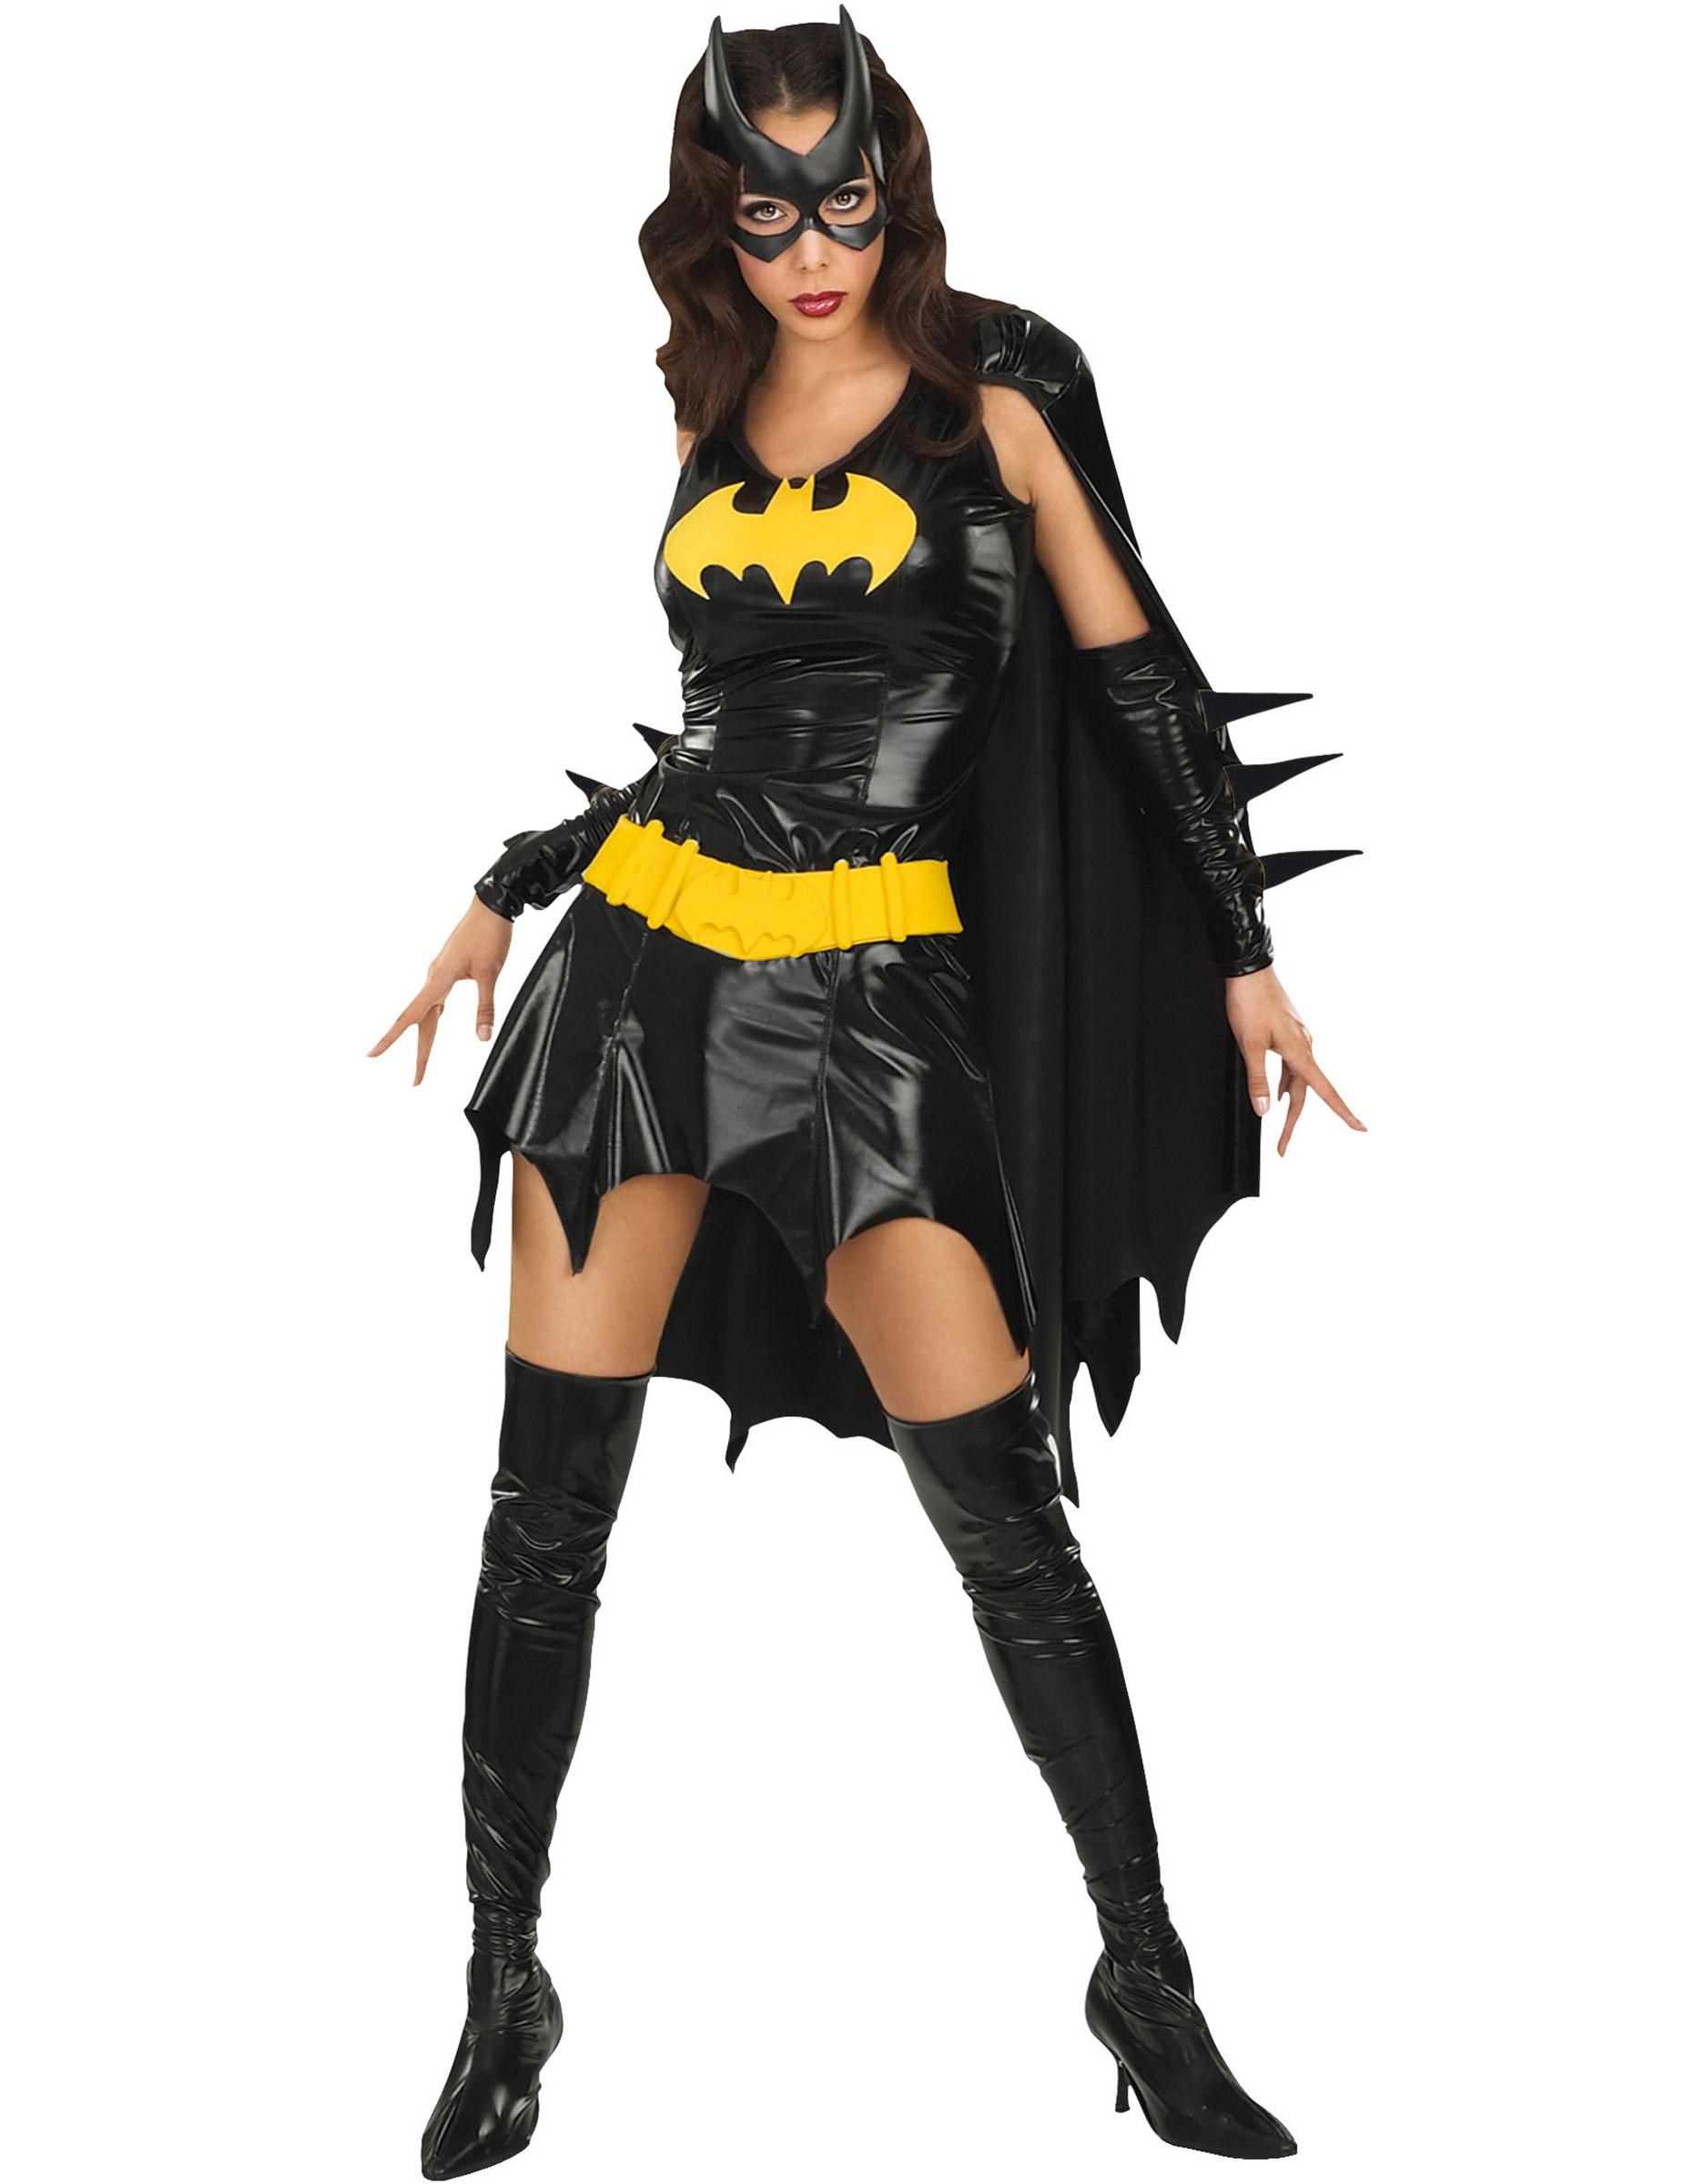 Superhelden Kostum Gunstige Kostume Superhelden Bei Vegaoo